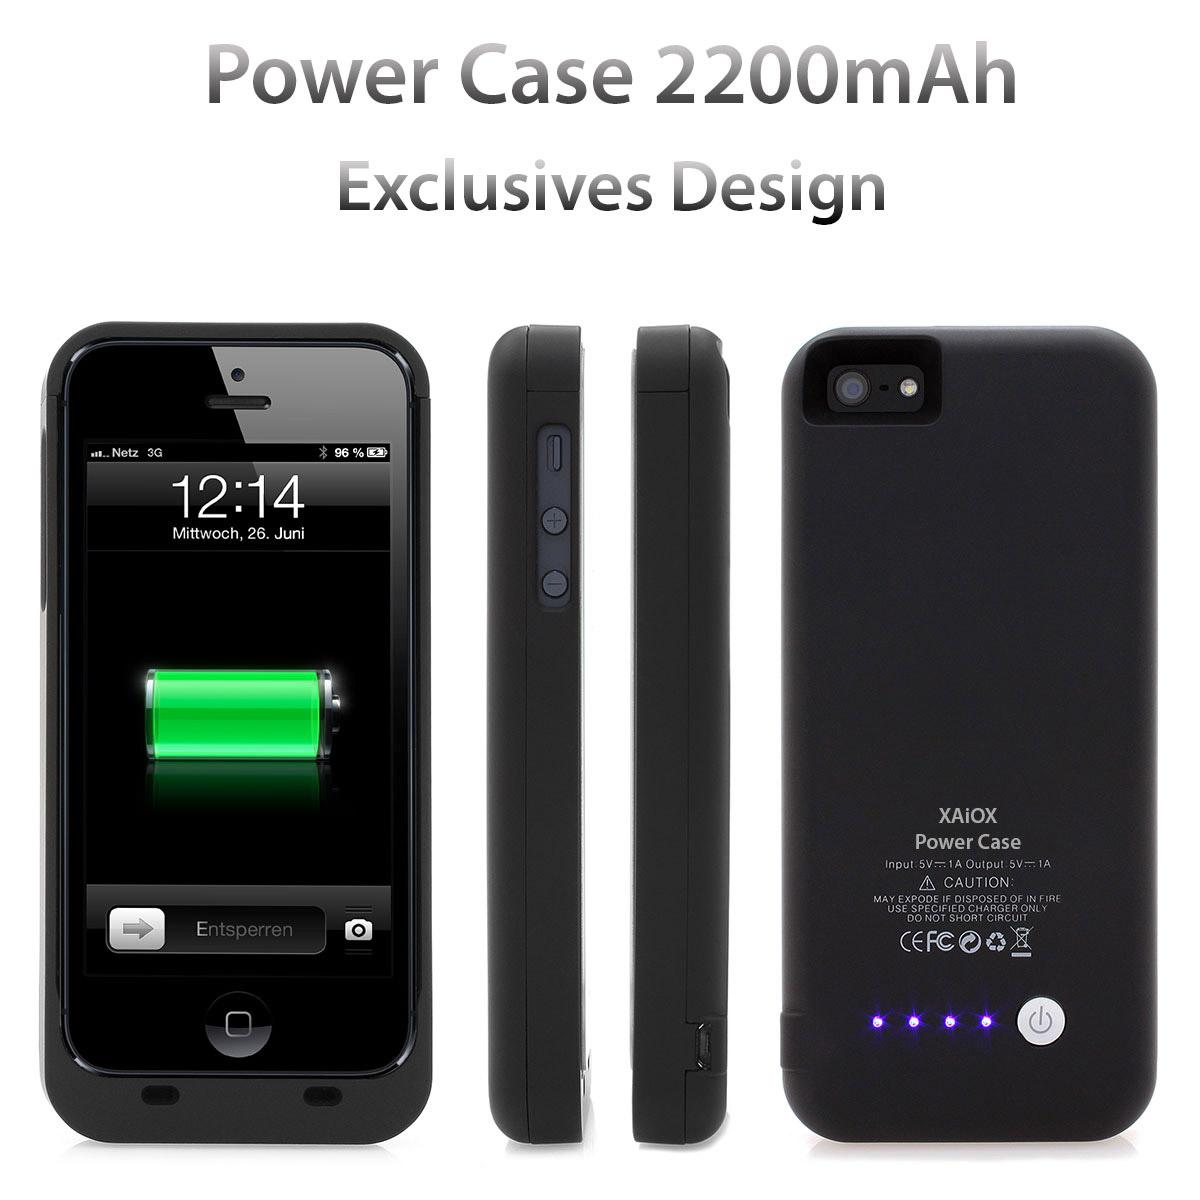 iPhone-5s-Power-Case-Akku-Li-Polymer-Cover-mit-2500mAh-Zusatzakku-schwarz